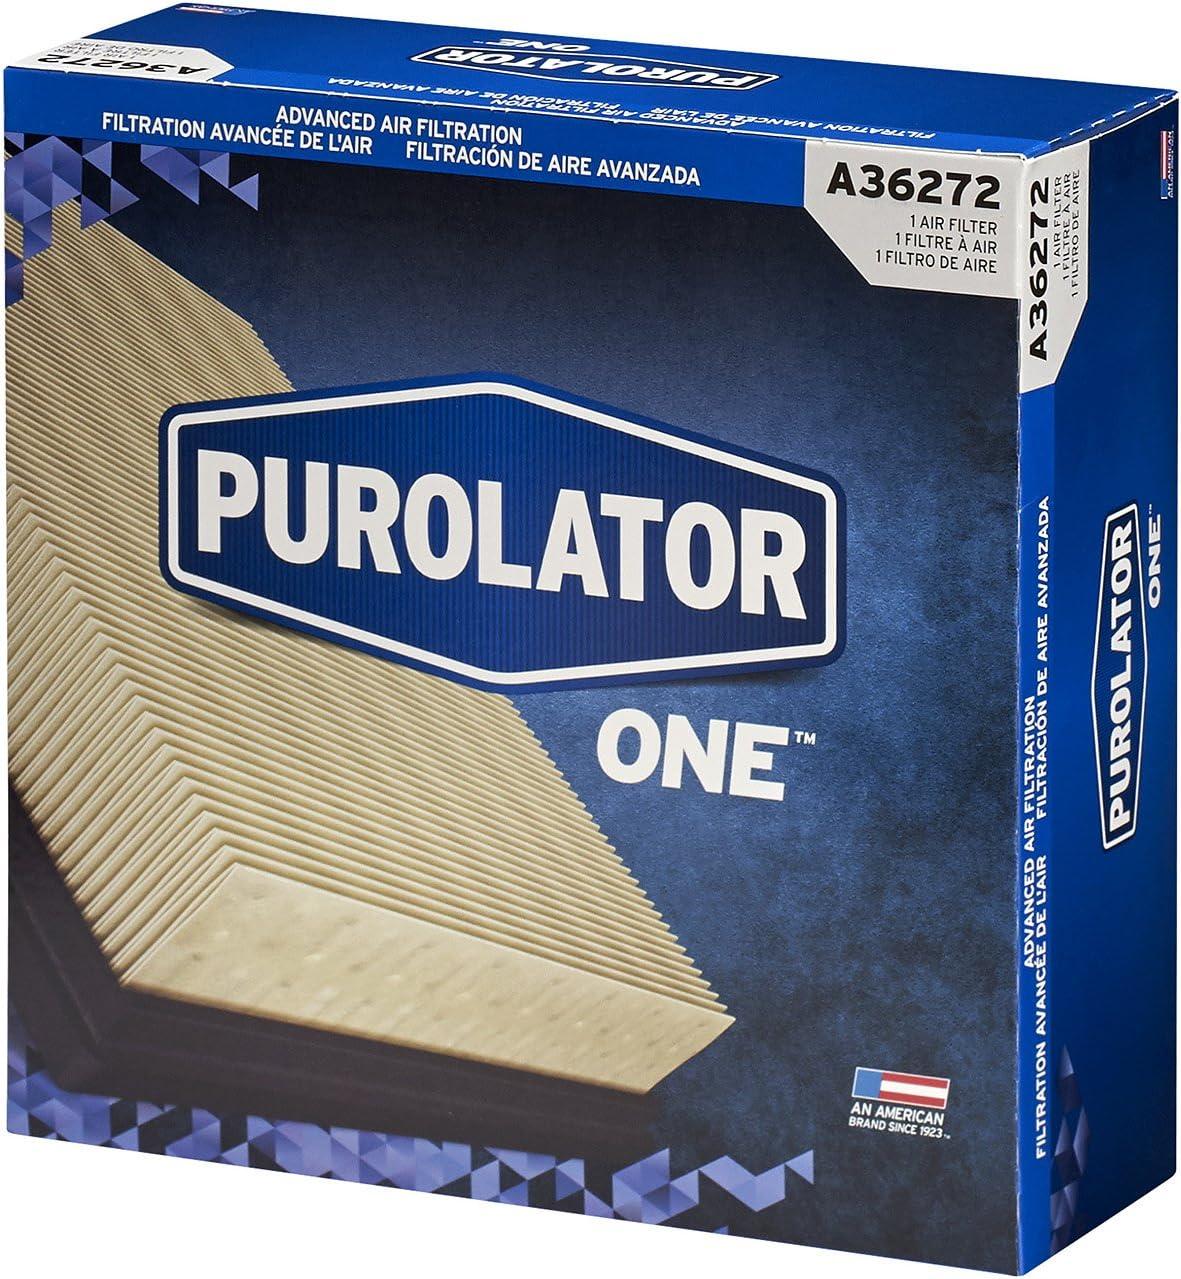 Purolator A36272 PurolatorONE Air Filter